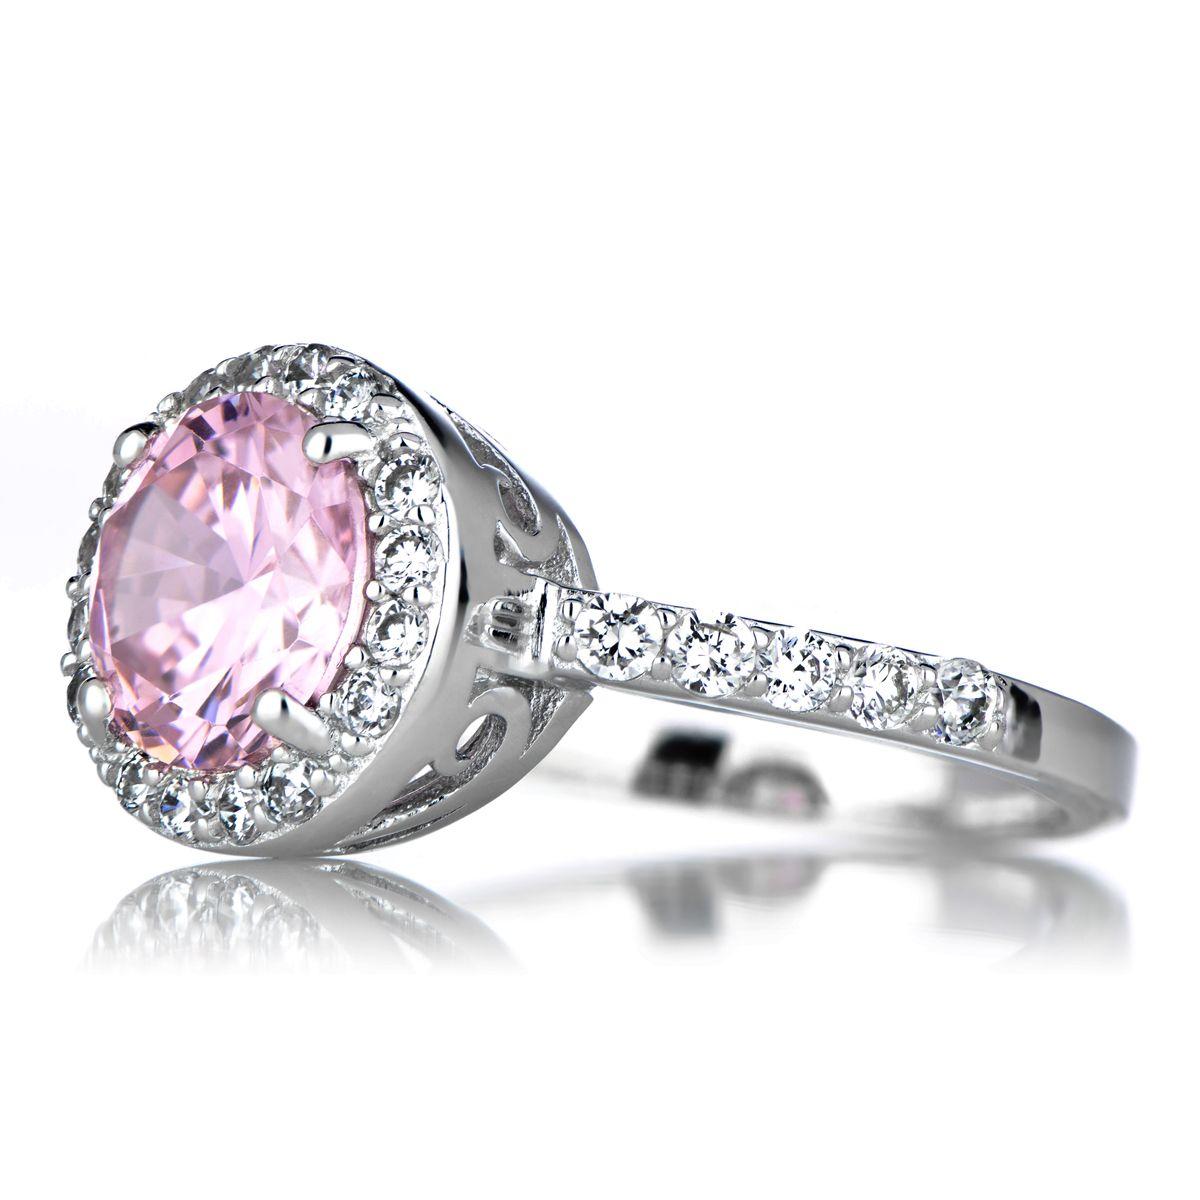 Sterling Silver October Birthstone Ring Pink Cz